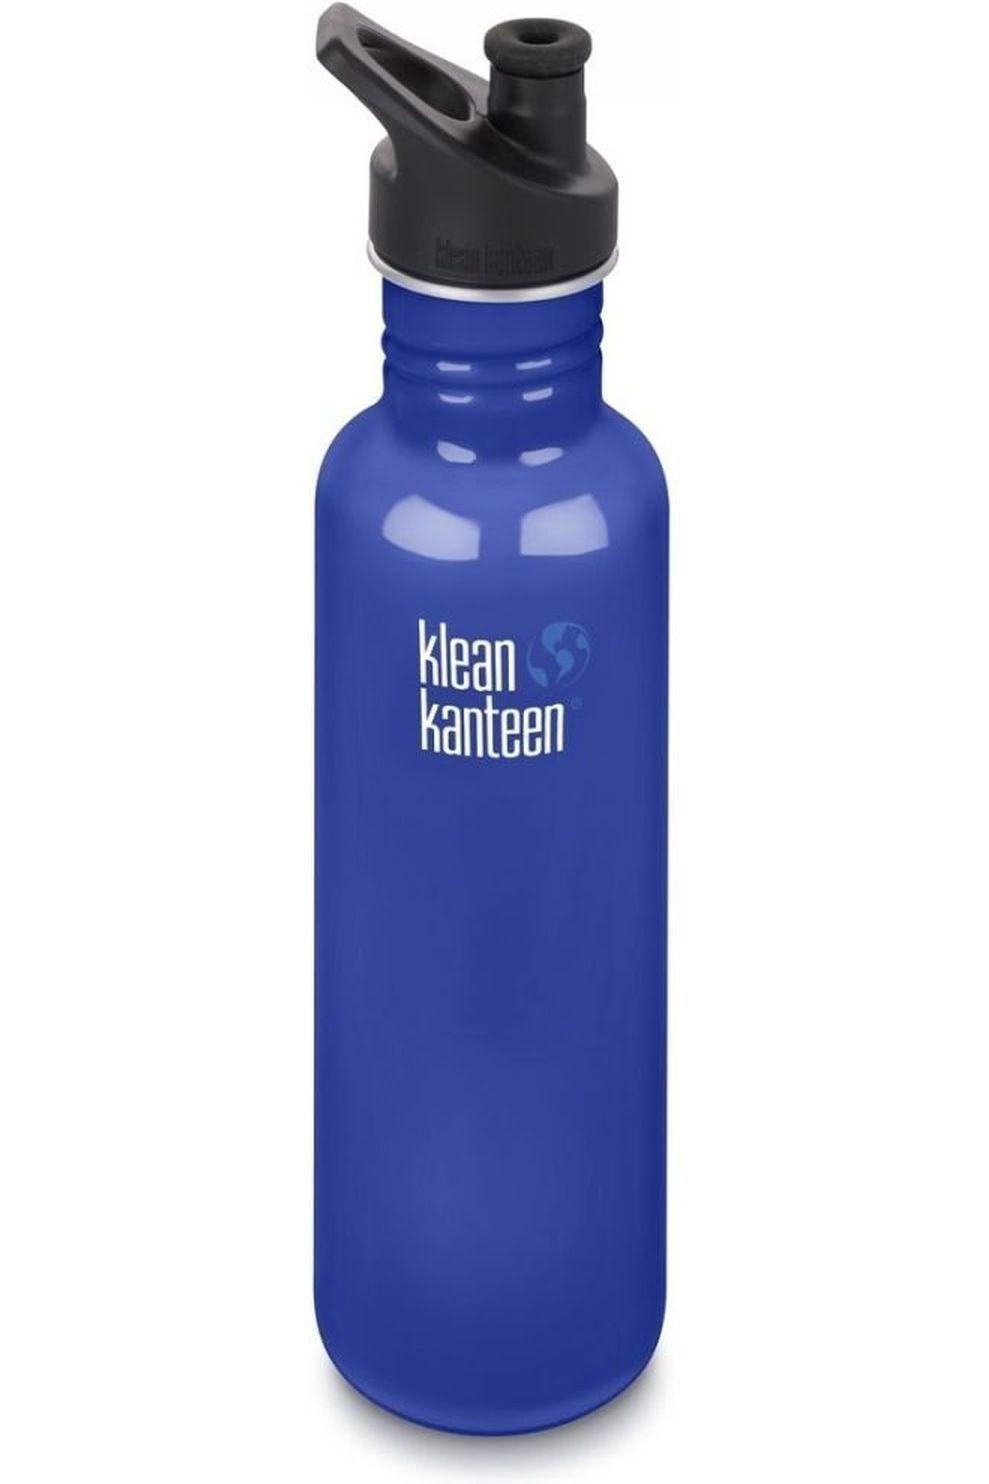 Klean Kanteen Drinkfles Classic Single Wall 27Oz 800Ml Sport - Blauw